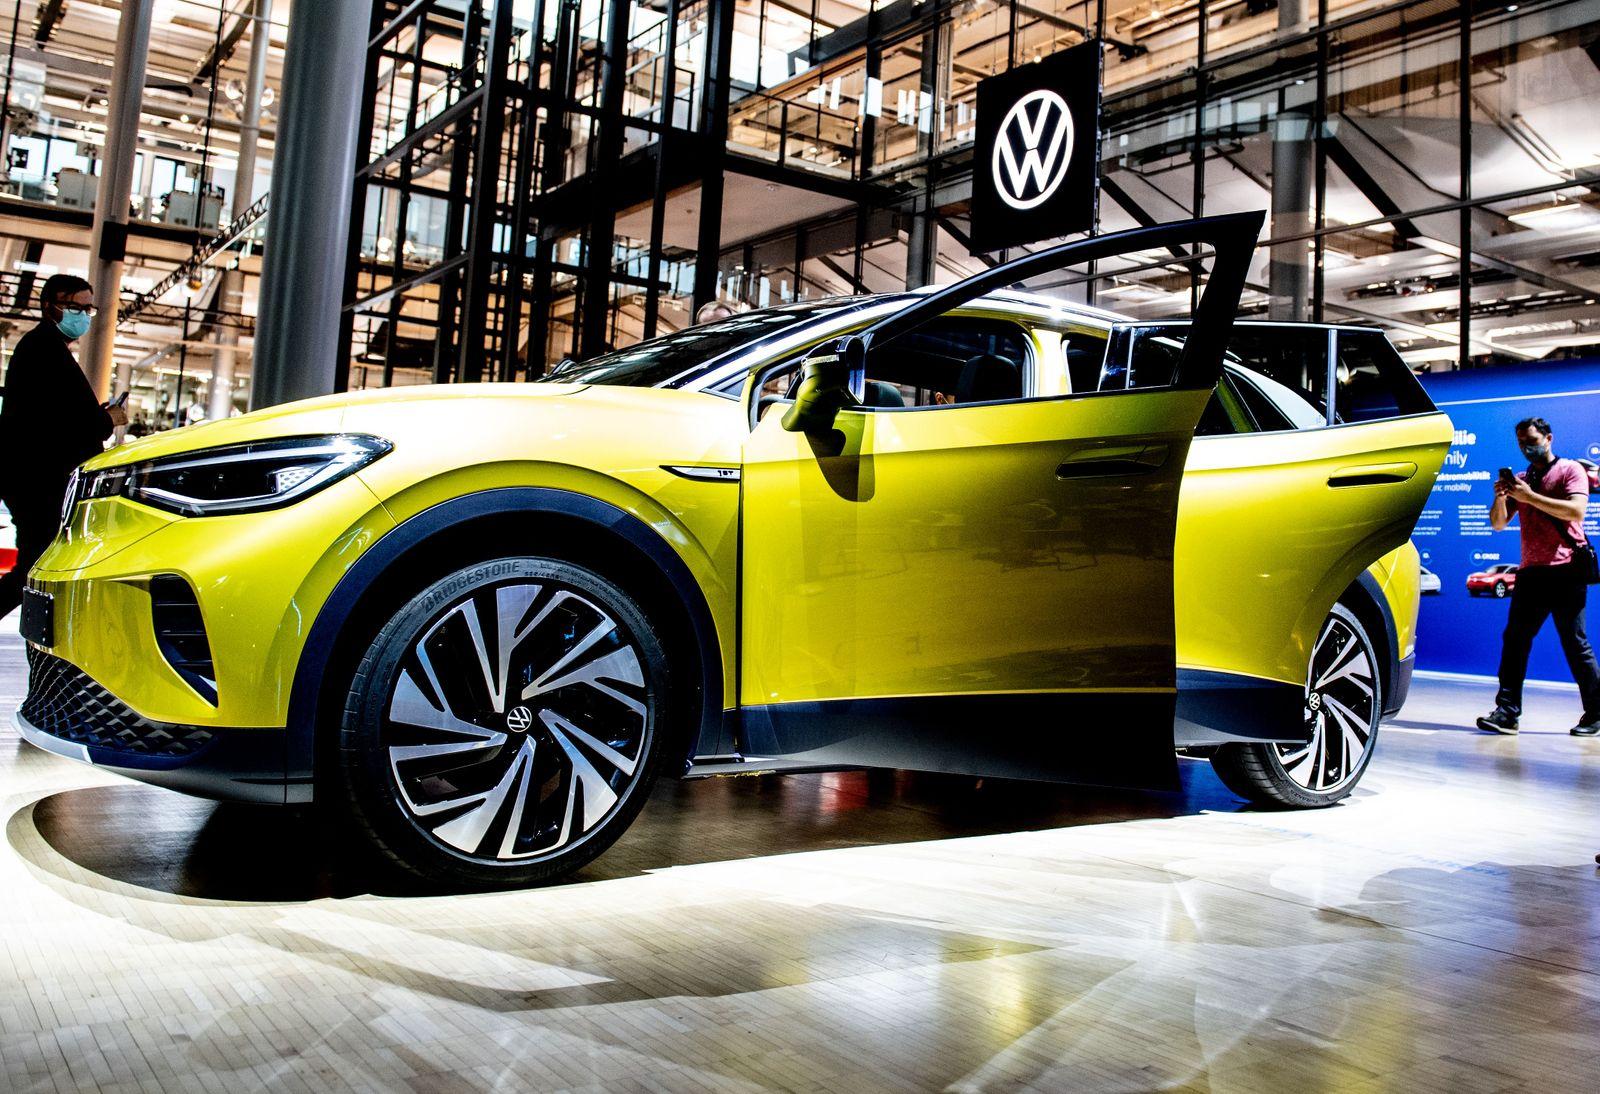 Volkswagen ID.4 presentation, Dresden, Germany - 23 Sep 2020